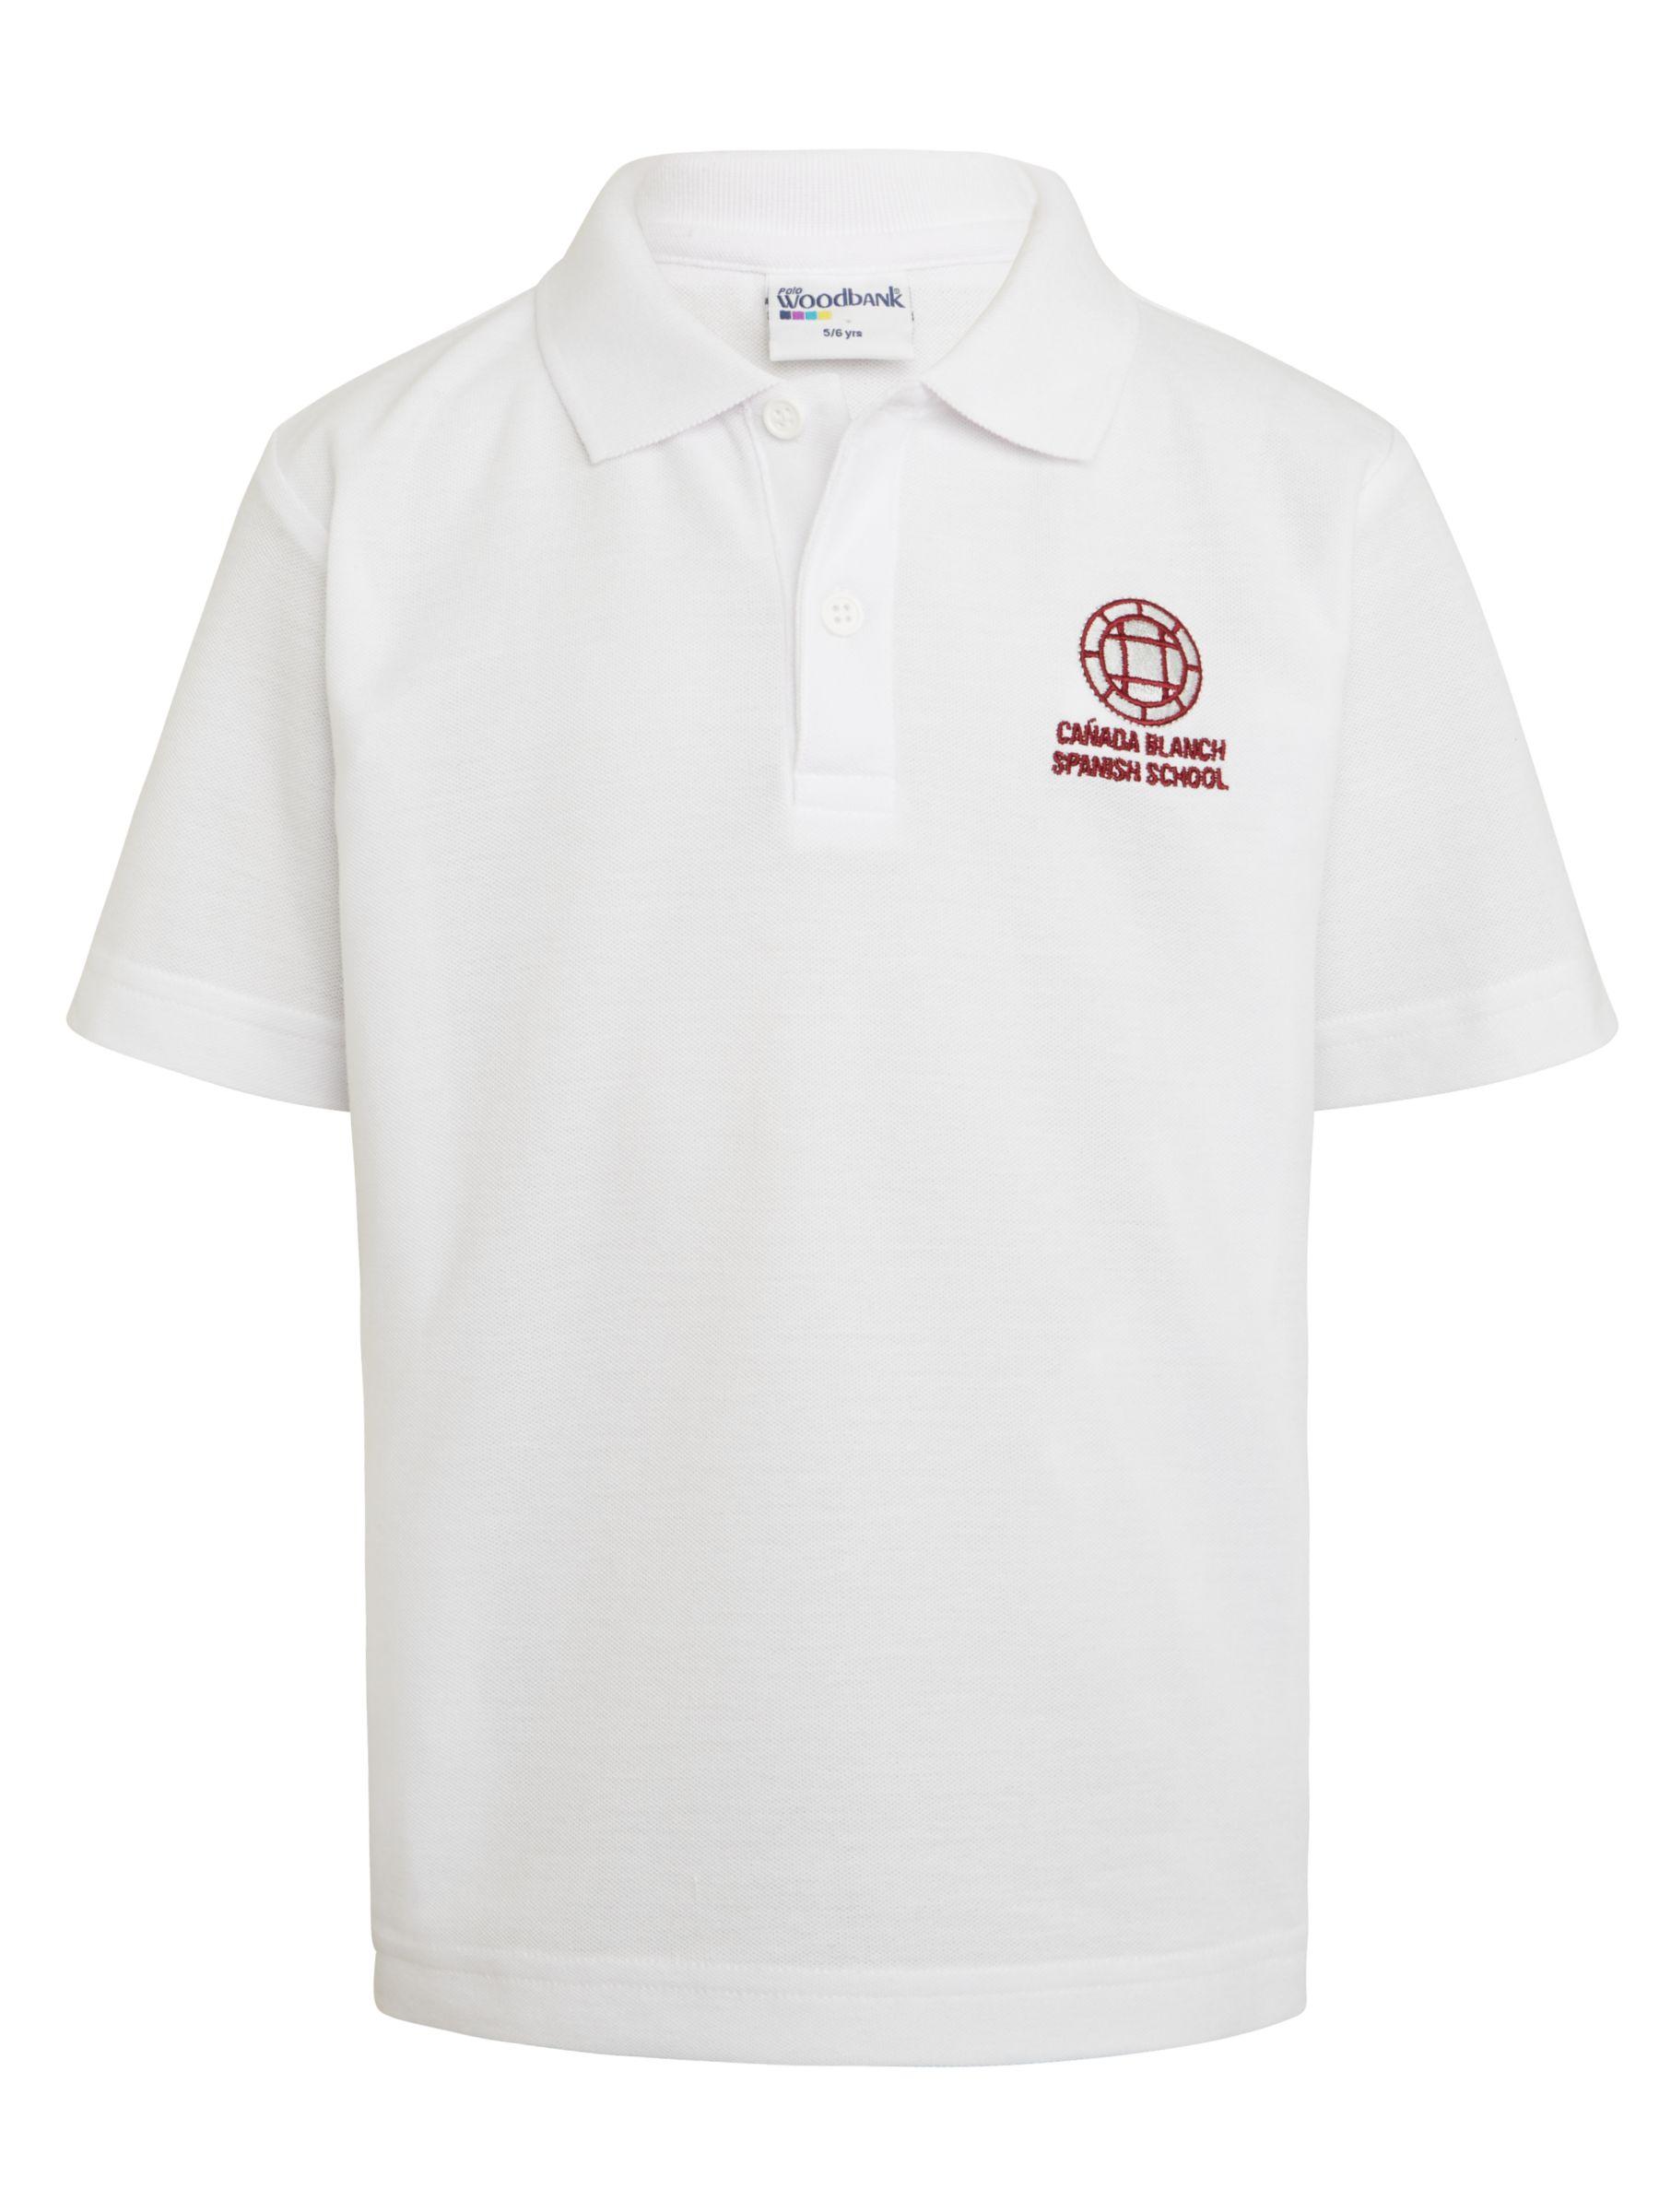 Unbranded Instituto Español Vicente Cañada Blanch School Polo Shirt, White